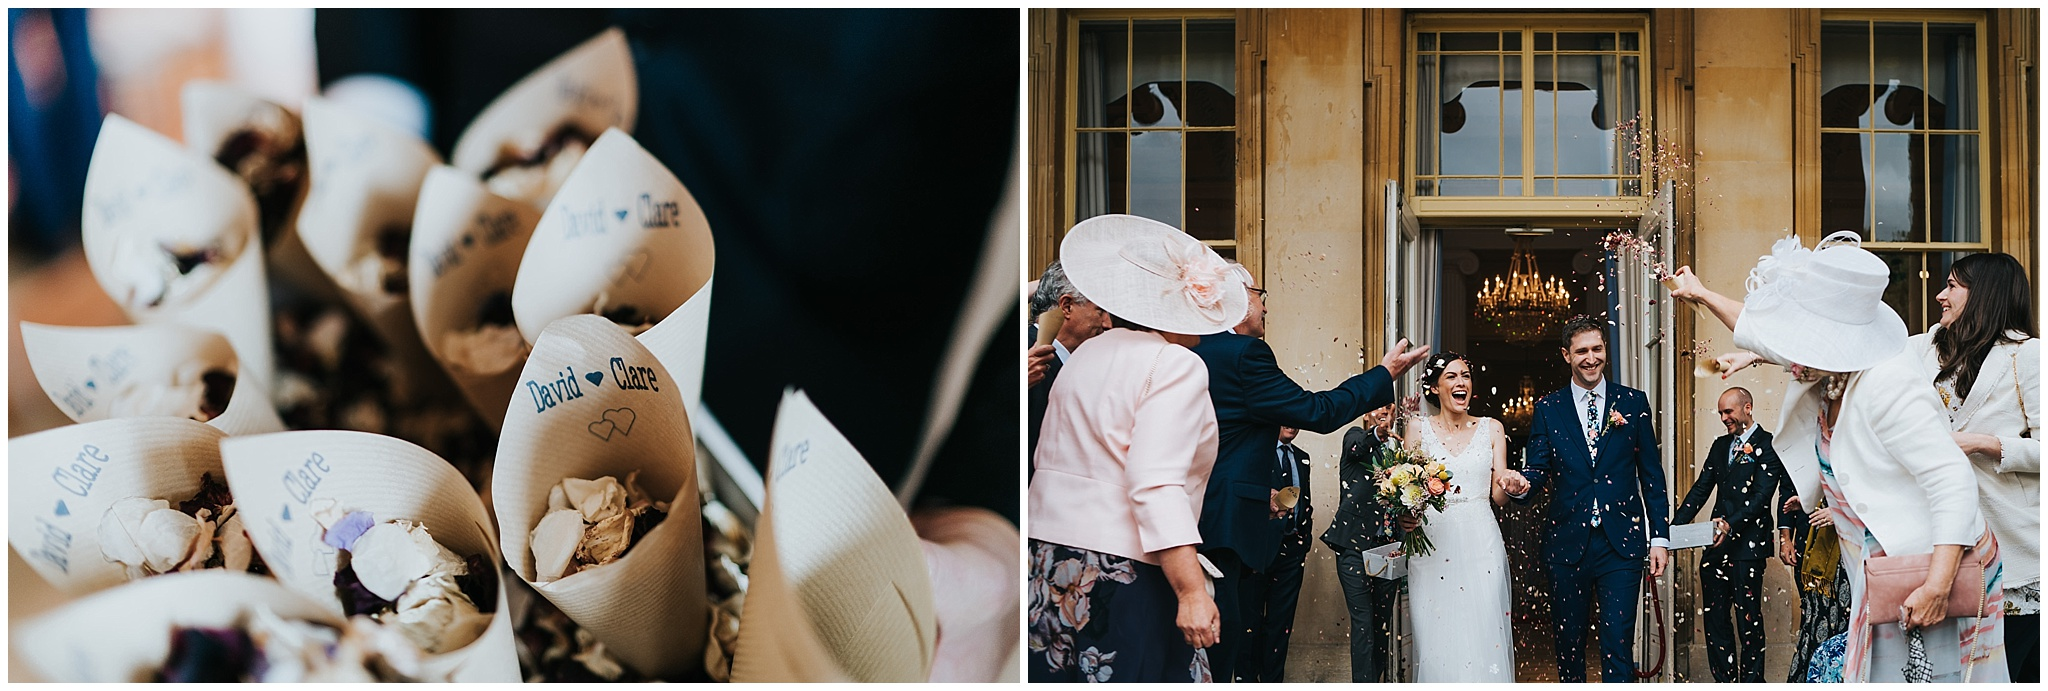 Stanway House Gloucester wedding photography034